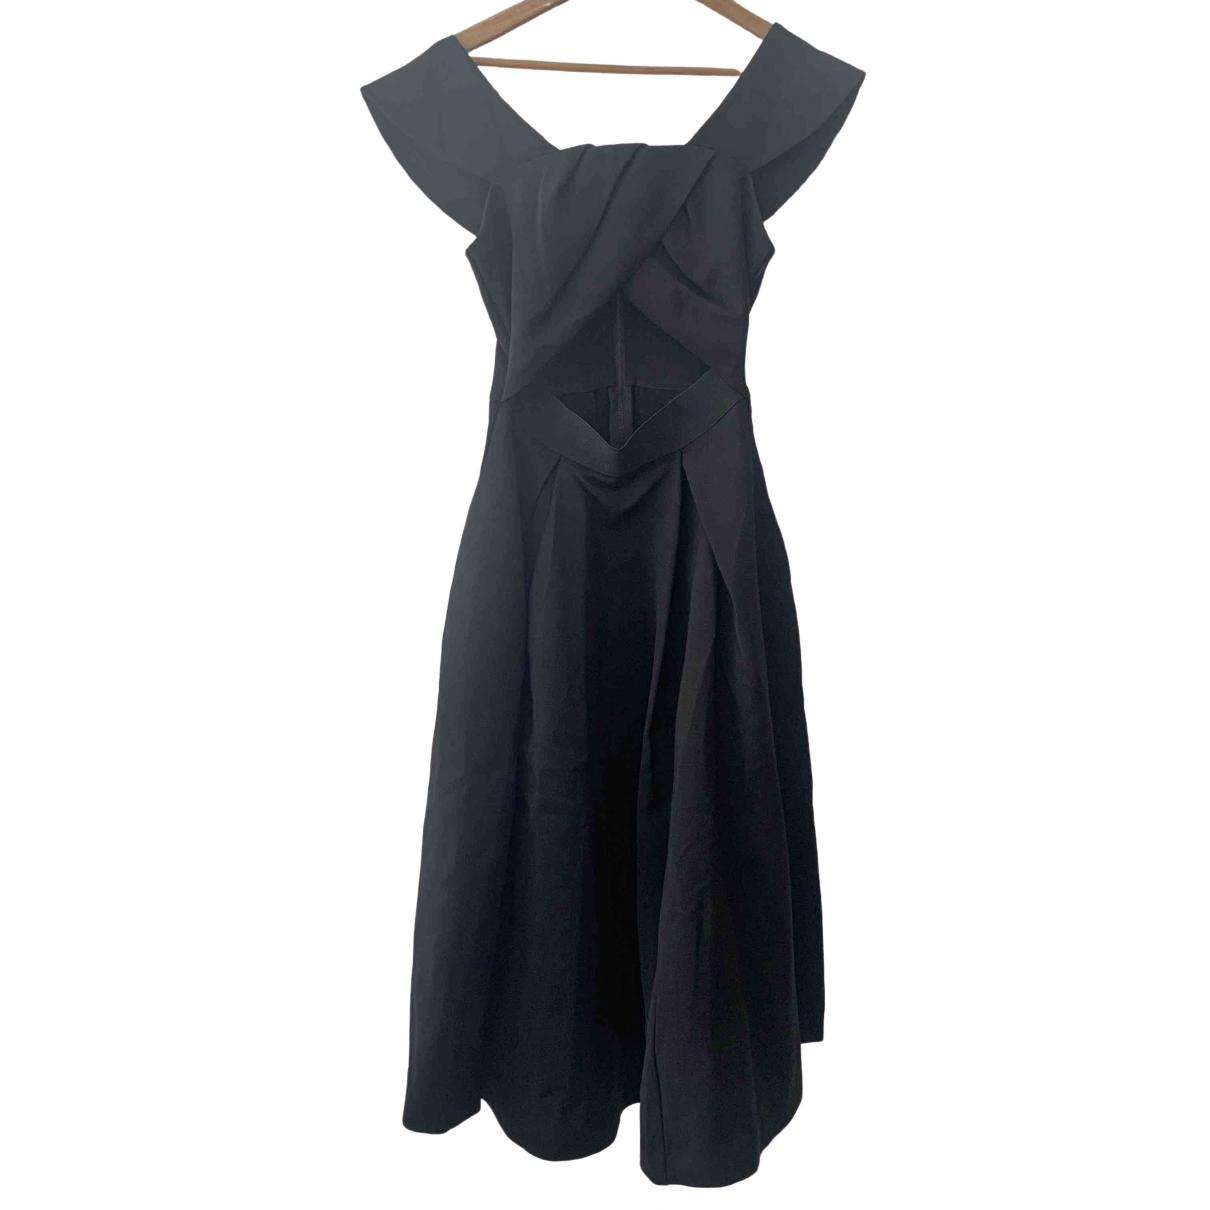 Self Portrait \N Black dress for Women 10 UK